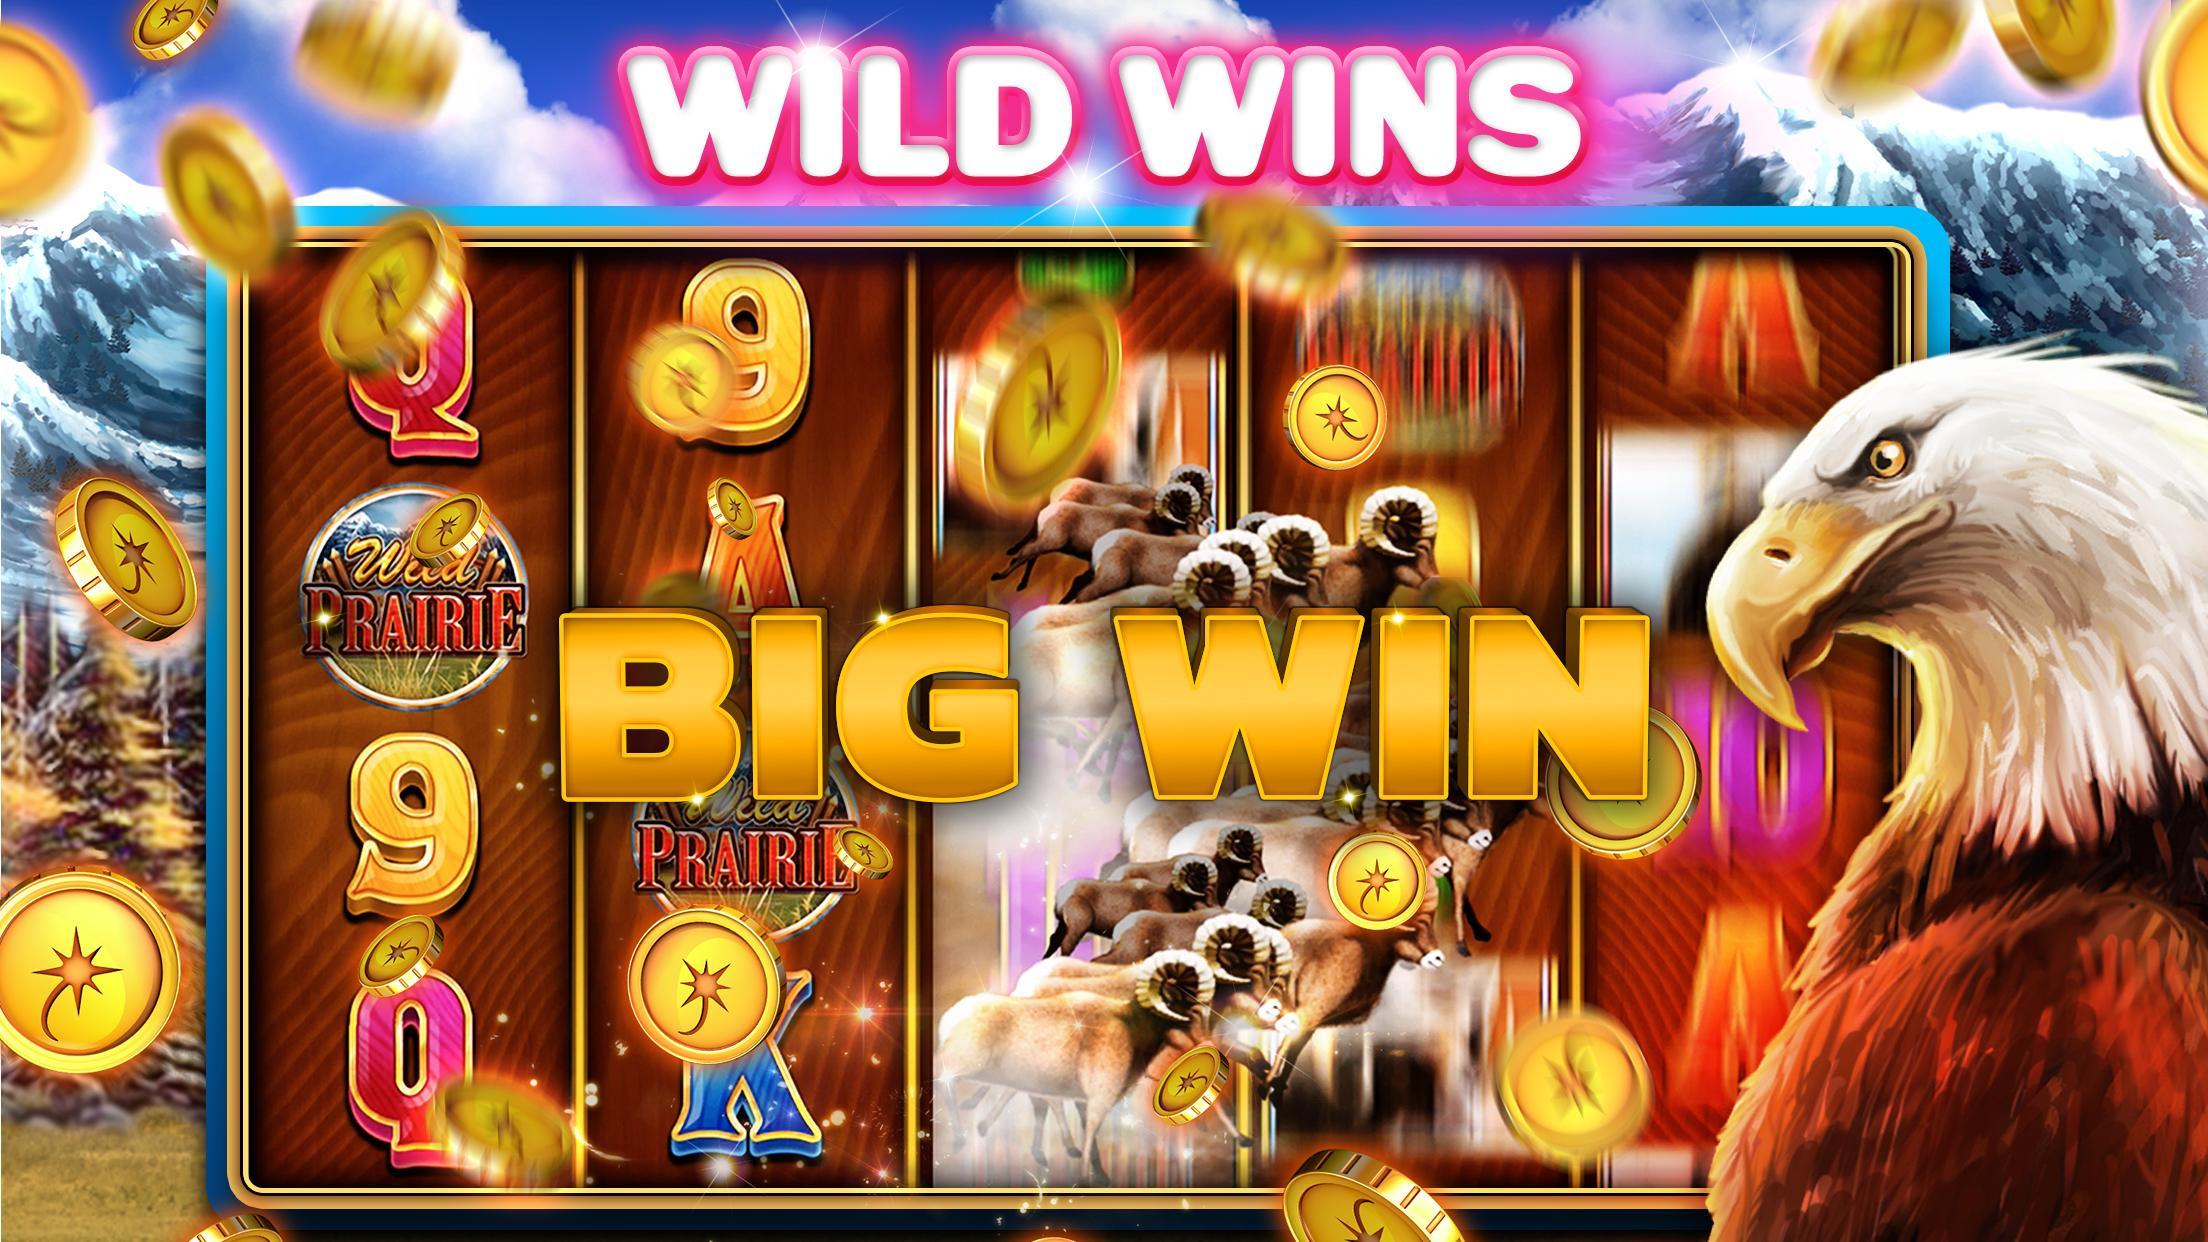 Jackpotjoy Slots Slot machines with Bonus Games 26.0.05 Screenshot 5